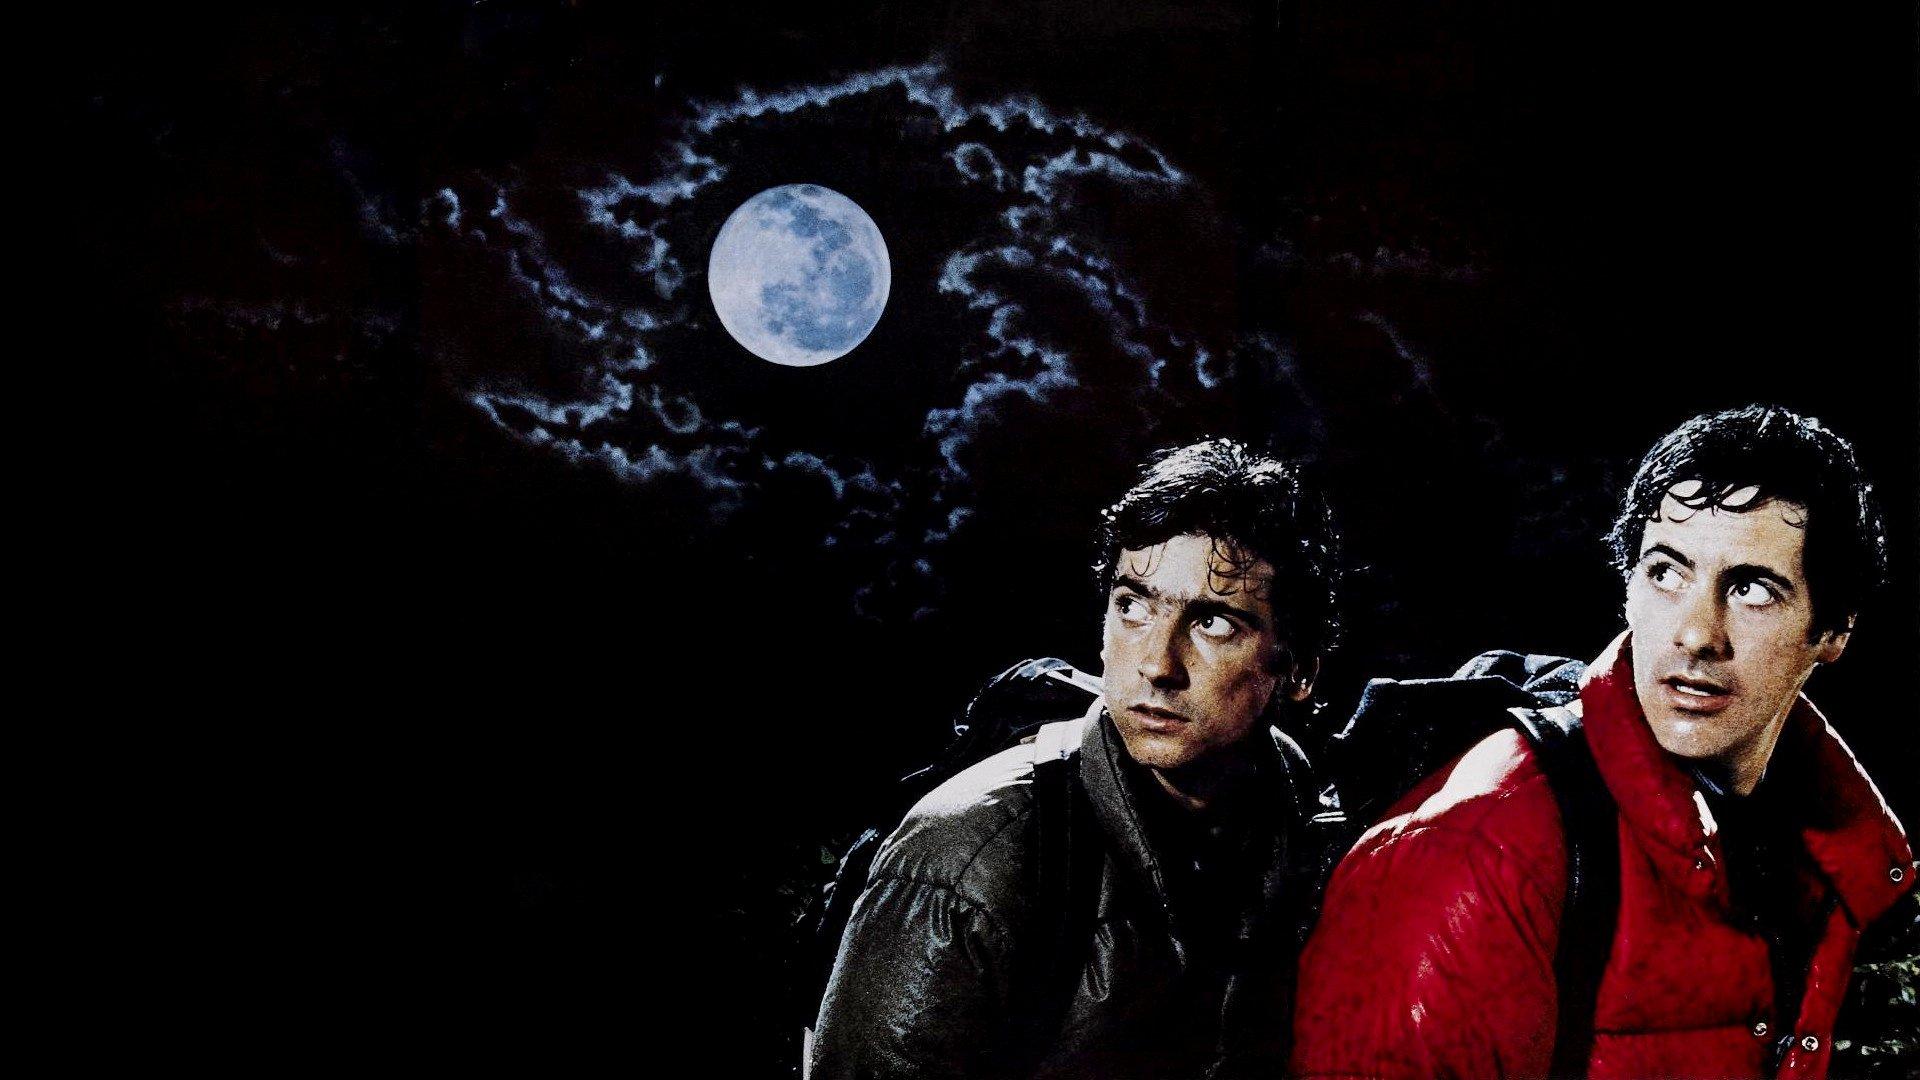 An American Werewolf In London Hd Wallpaper Background Image